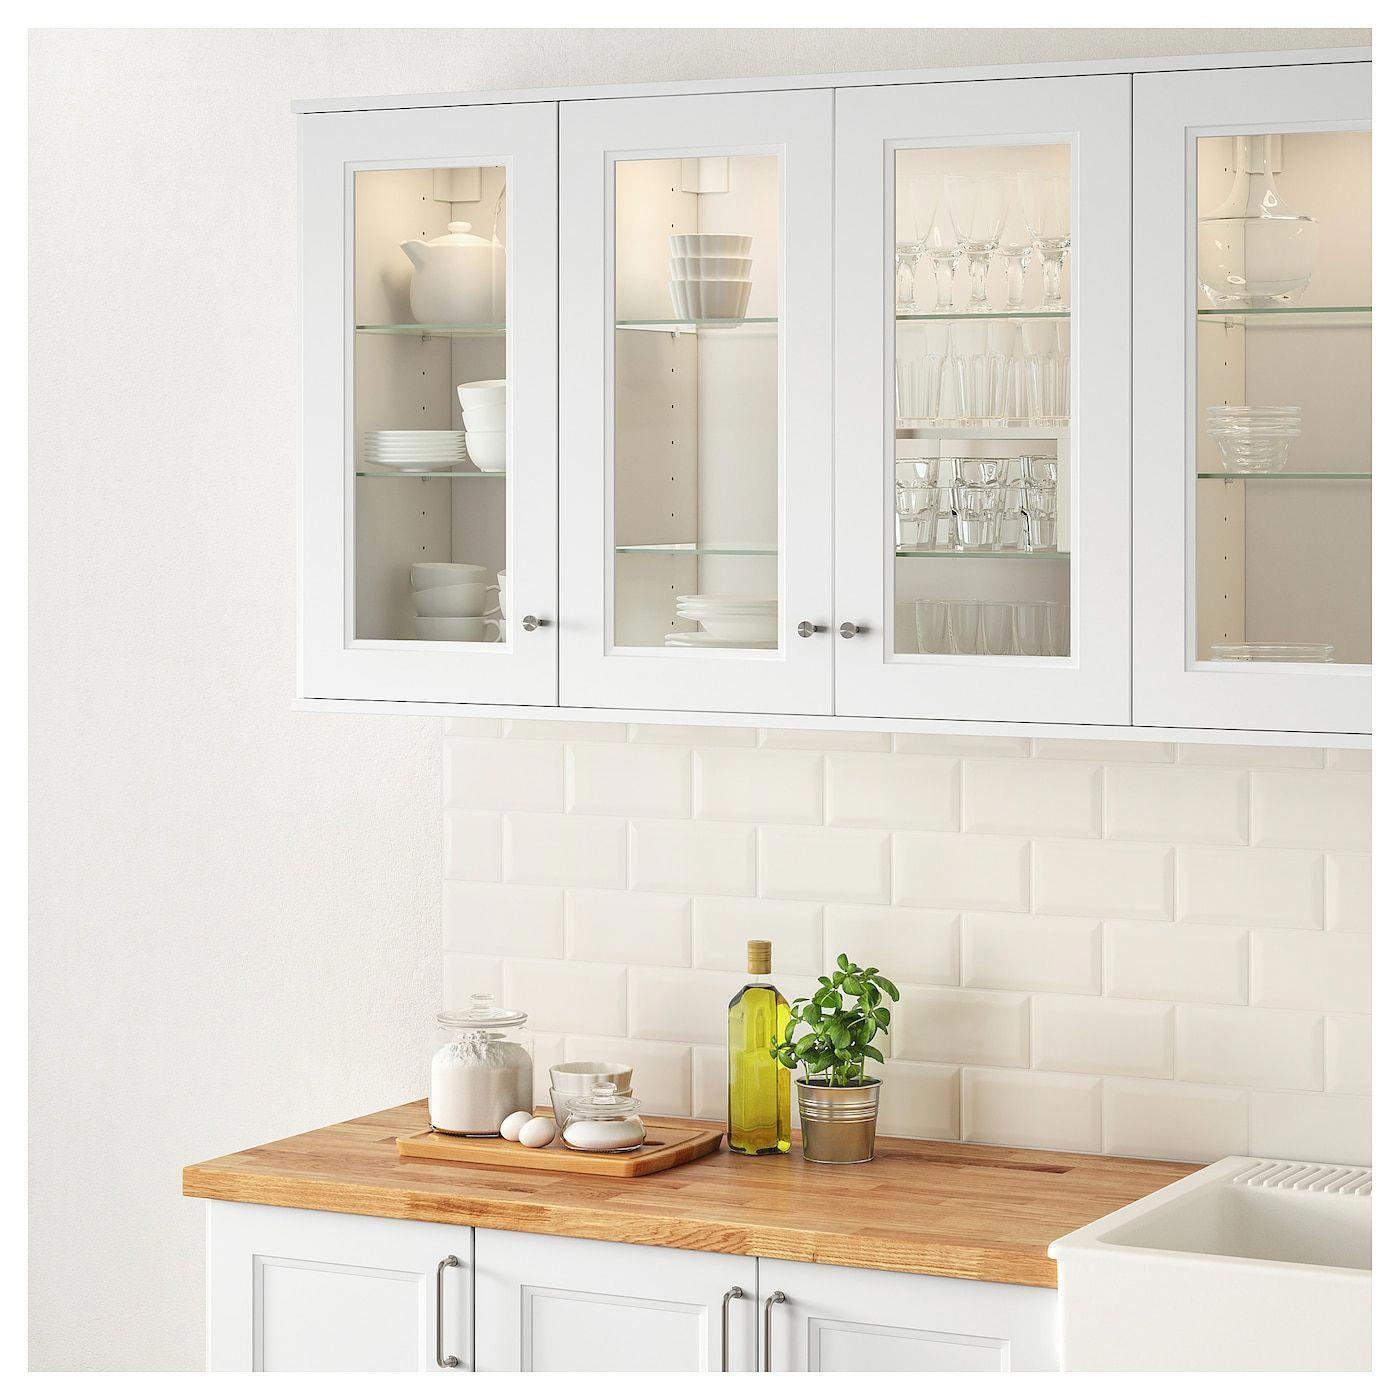 IKEA AXSTAD Glass door matt white whitekitchen in 2020